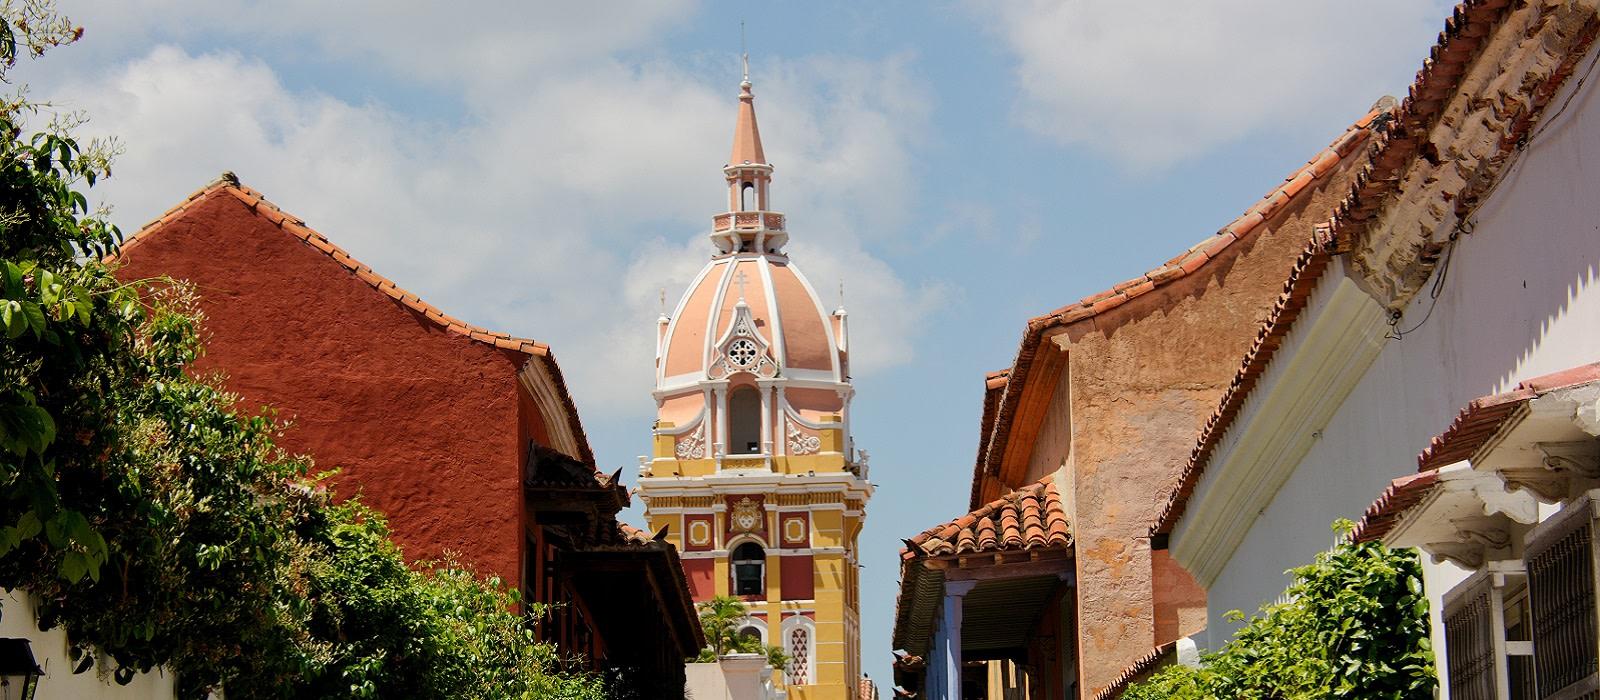 Kolumbien: Großstadtleben, Kaffee & Kolonialflair Urlaub 1